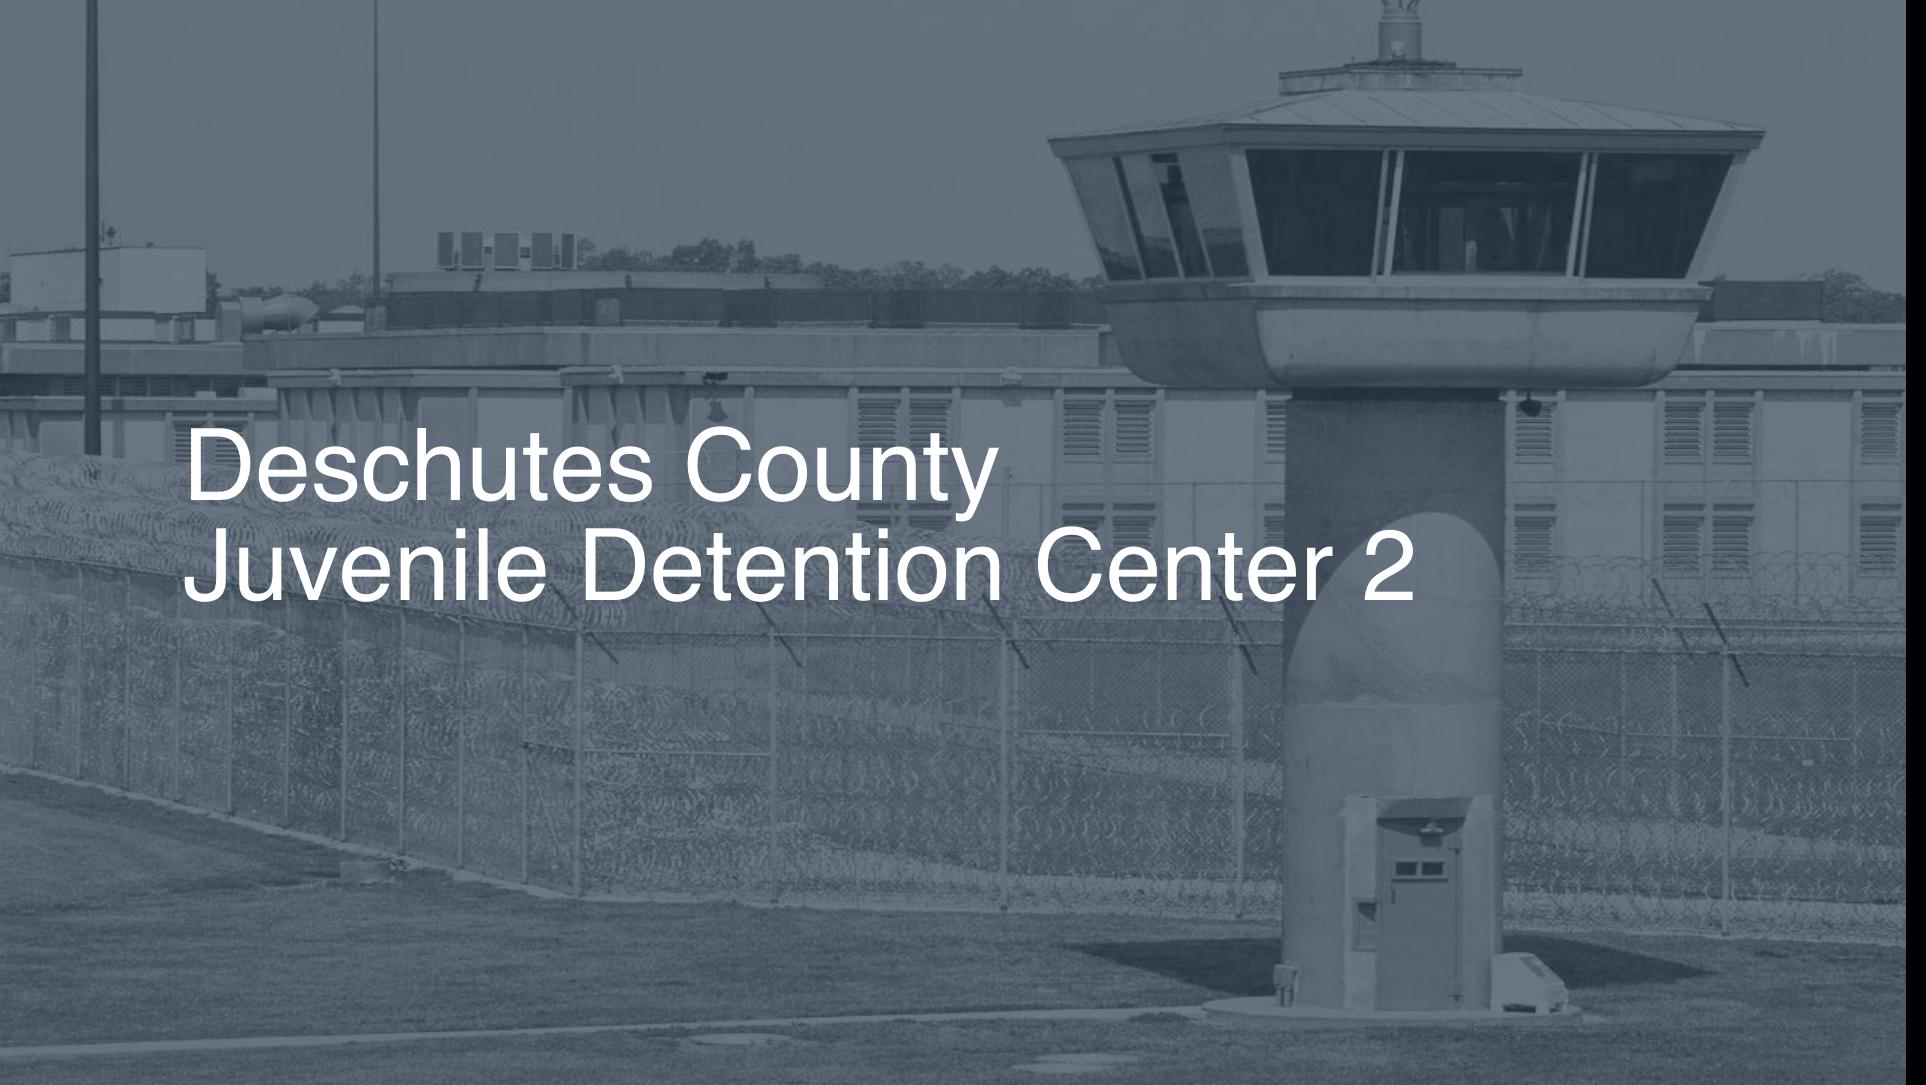 Deschutes County Juvenile Detention Center | Pigeonly